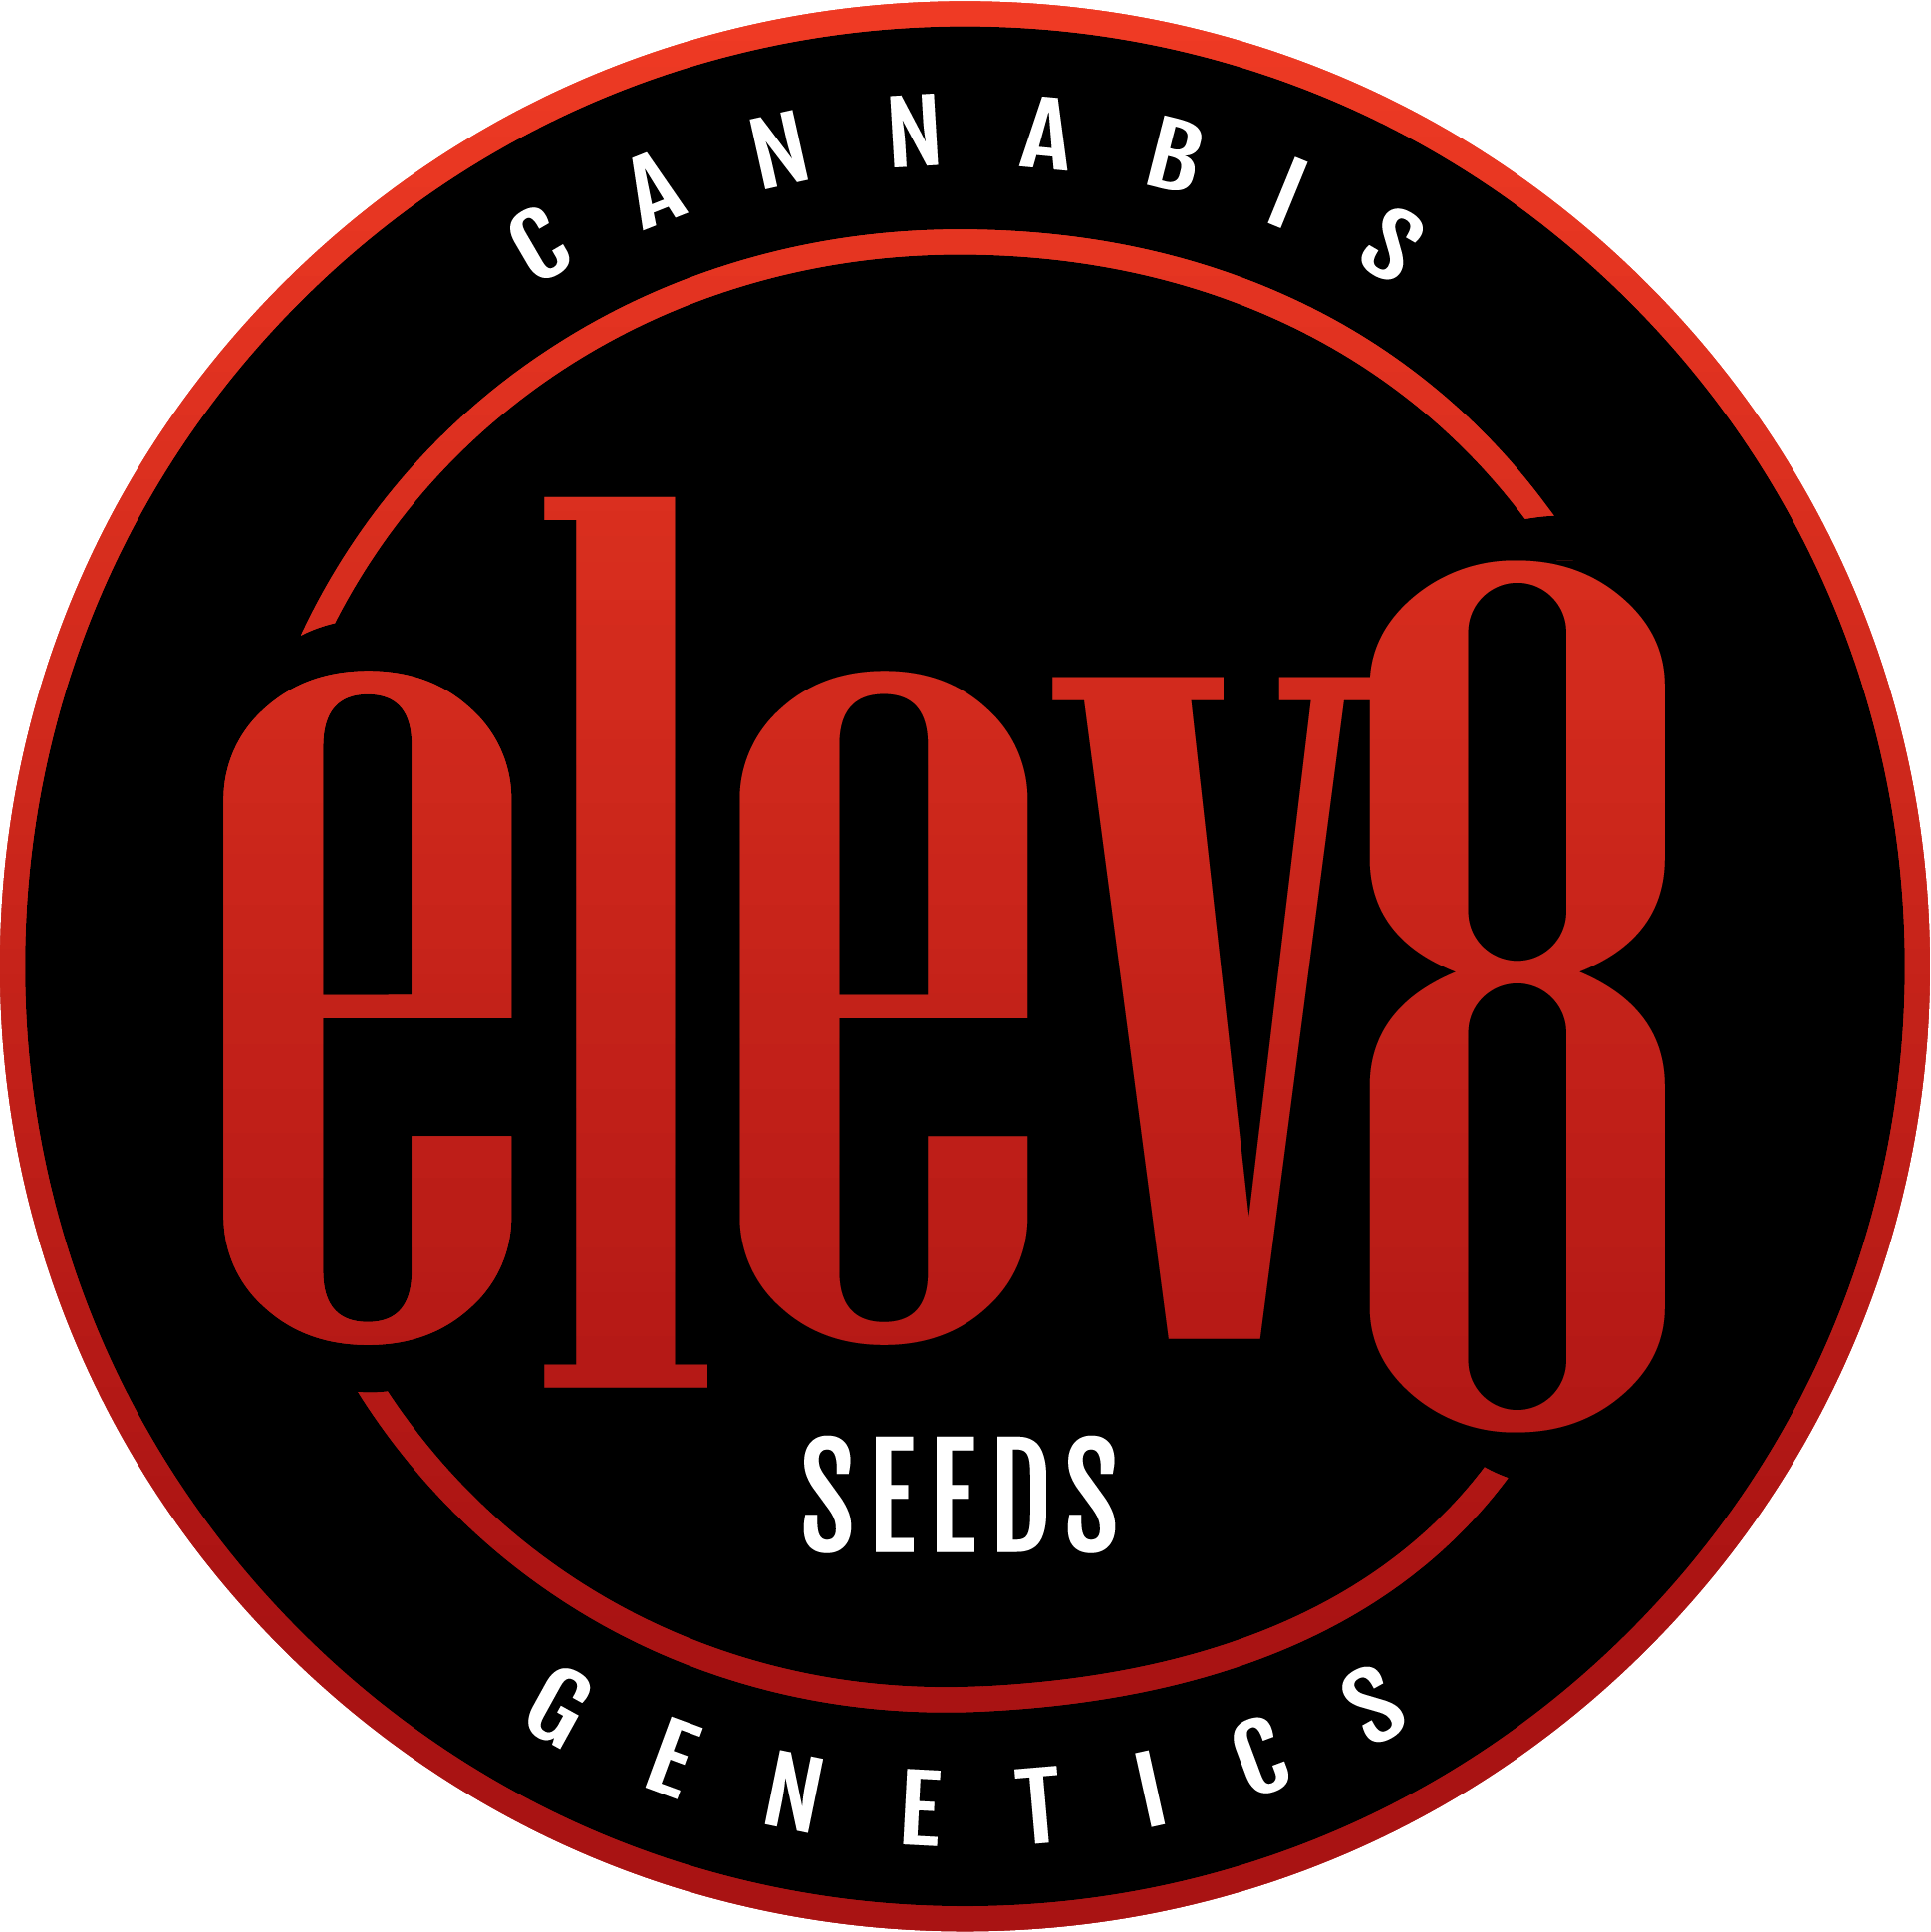 elev8-seeds-genetica-americana